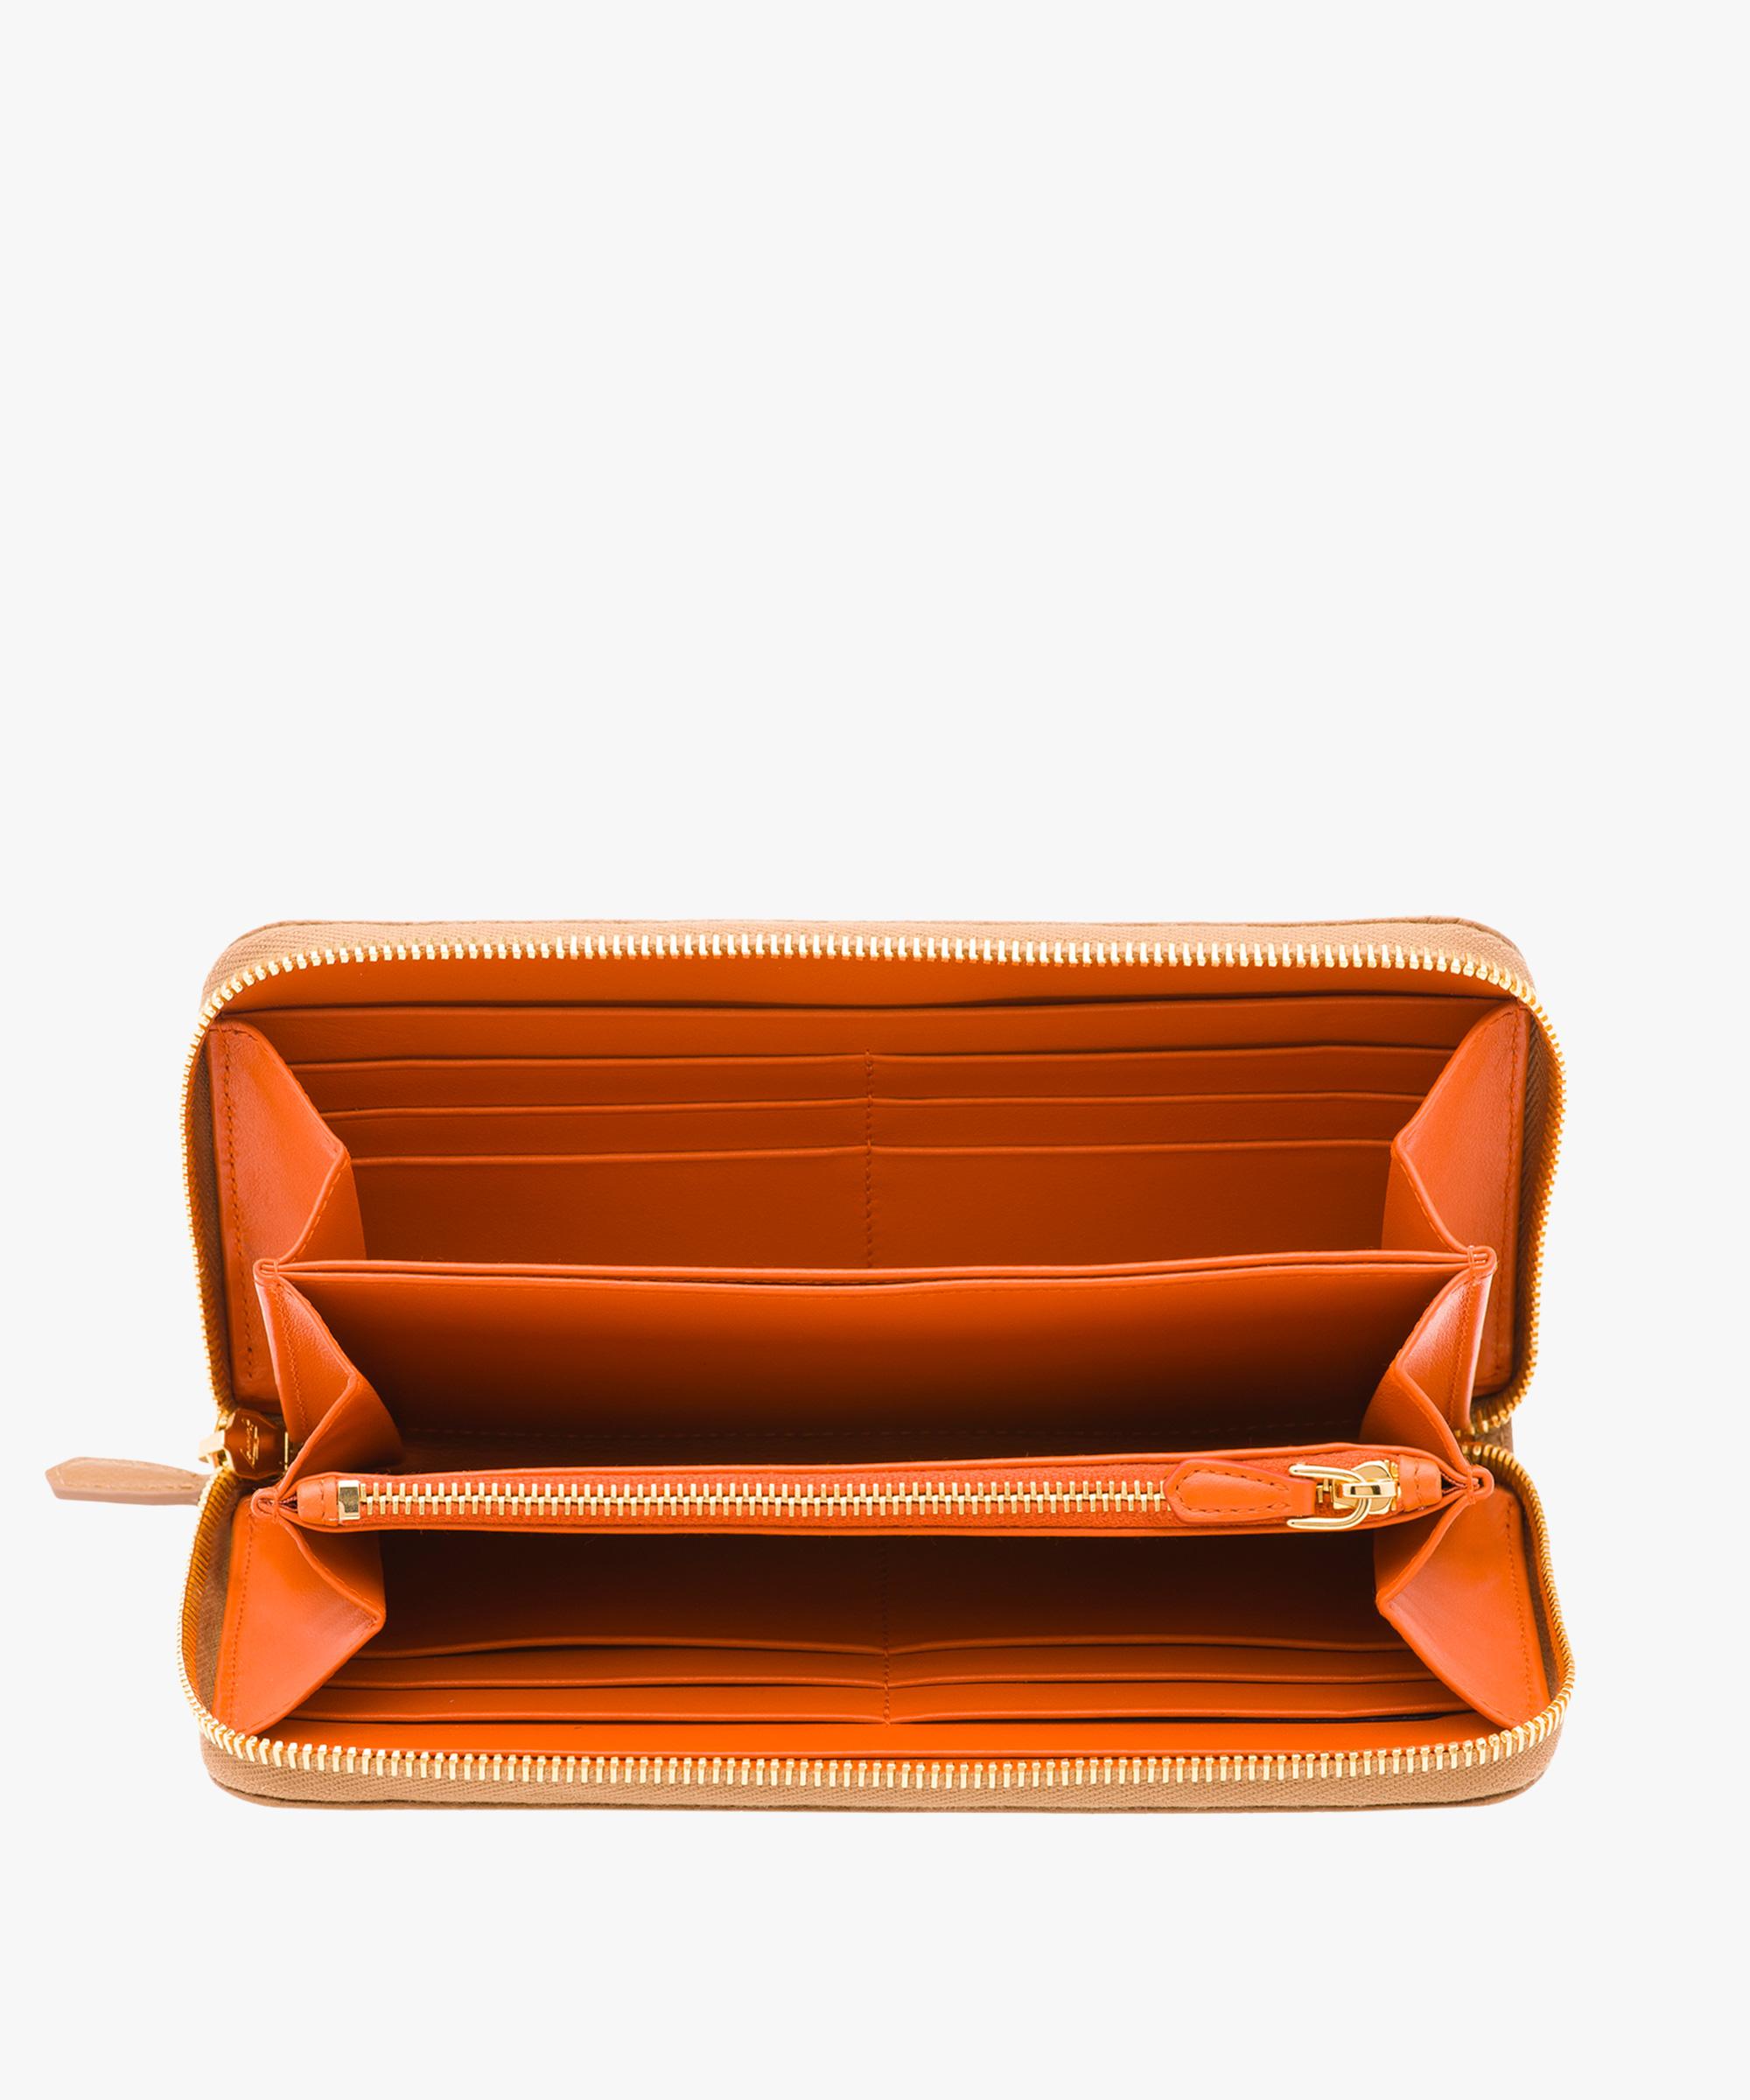 12da8eba3665e4 Leather Wallet Prada CARAMEL/PAPAYA ...